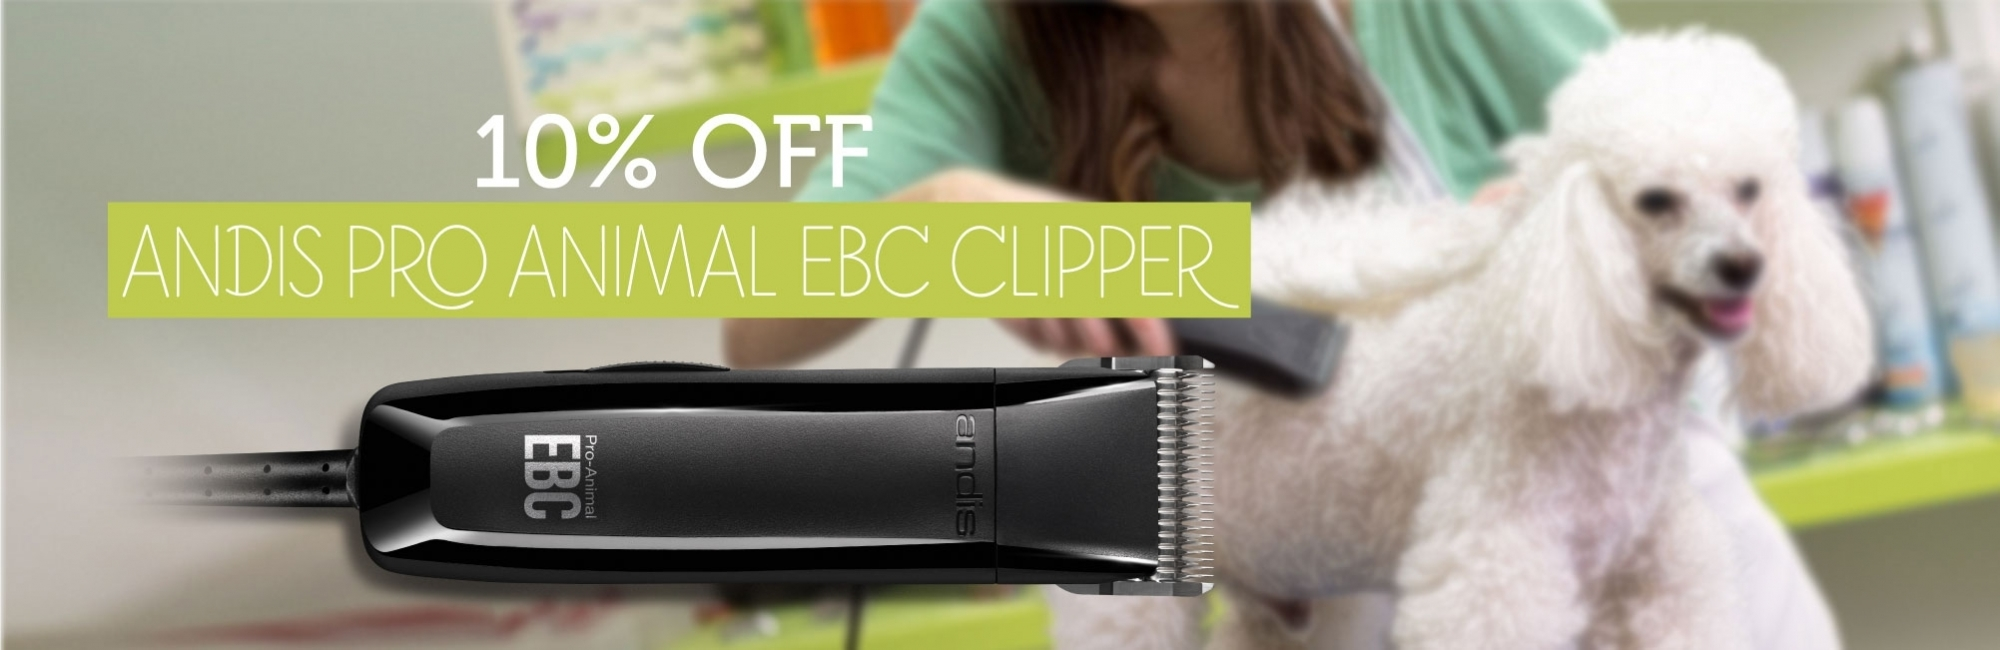 10% OFF Andis Pro Animal EBC Clipper